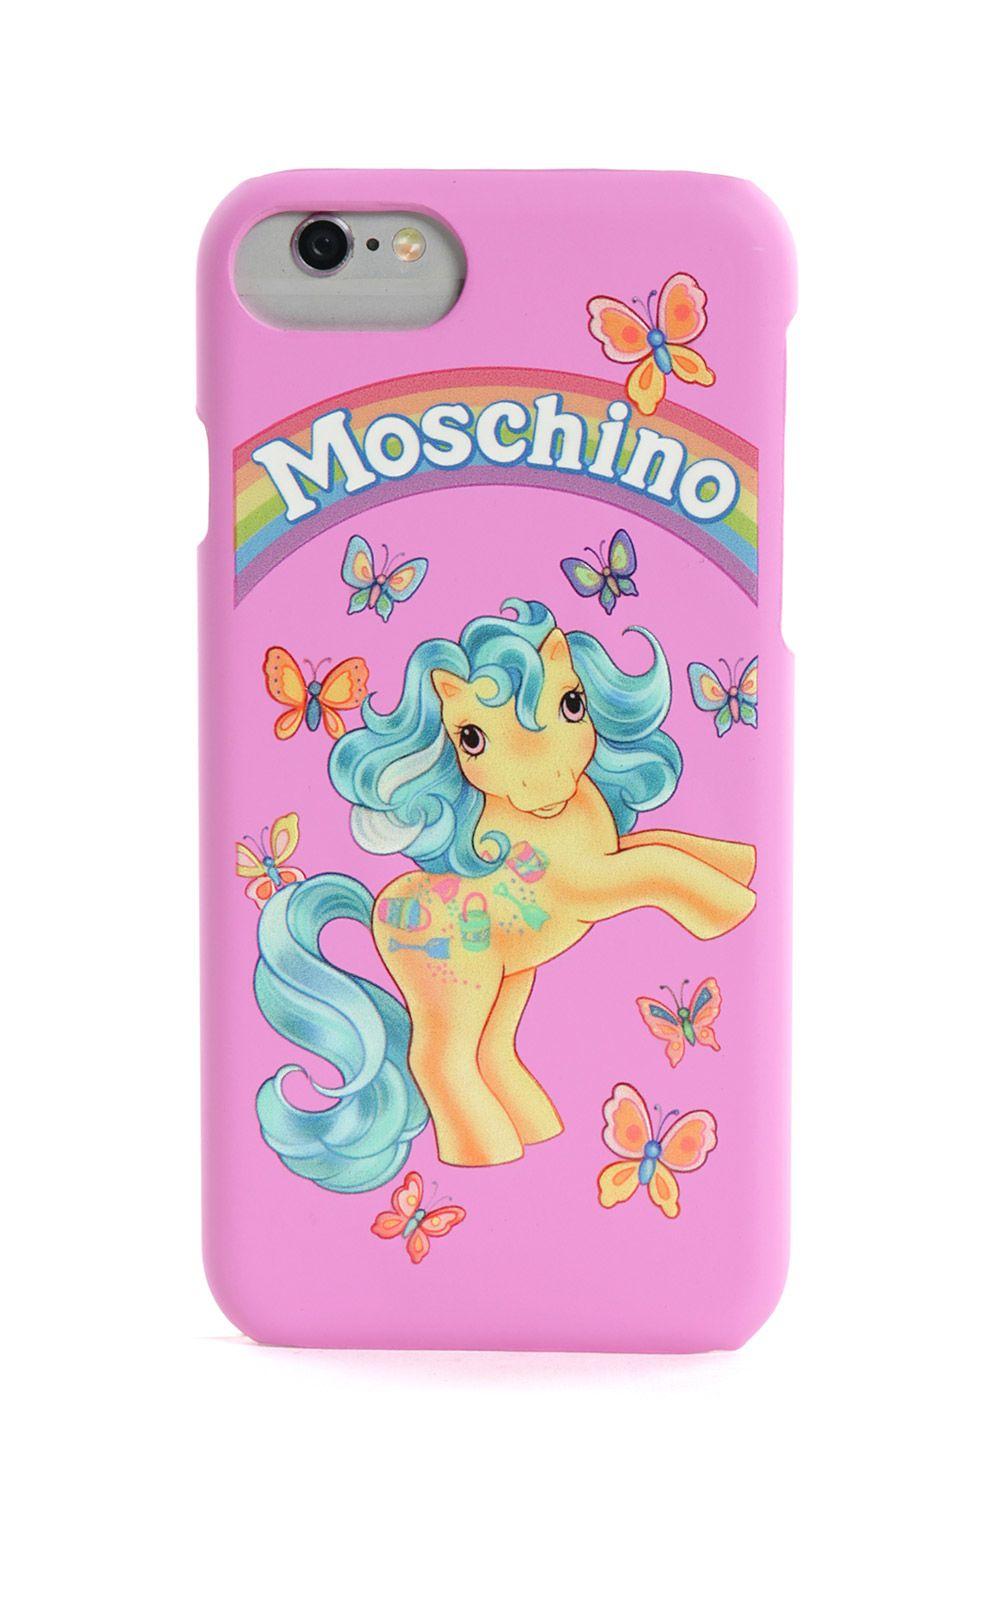 Moschino Iphone C Case